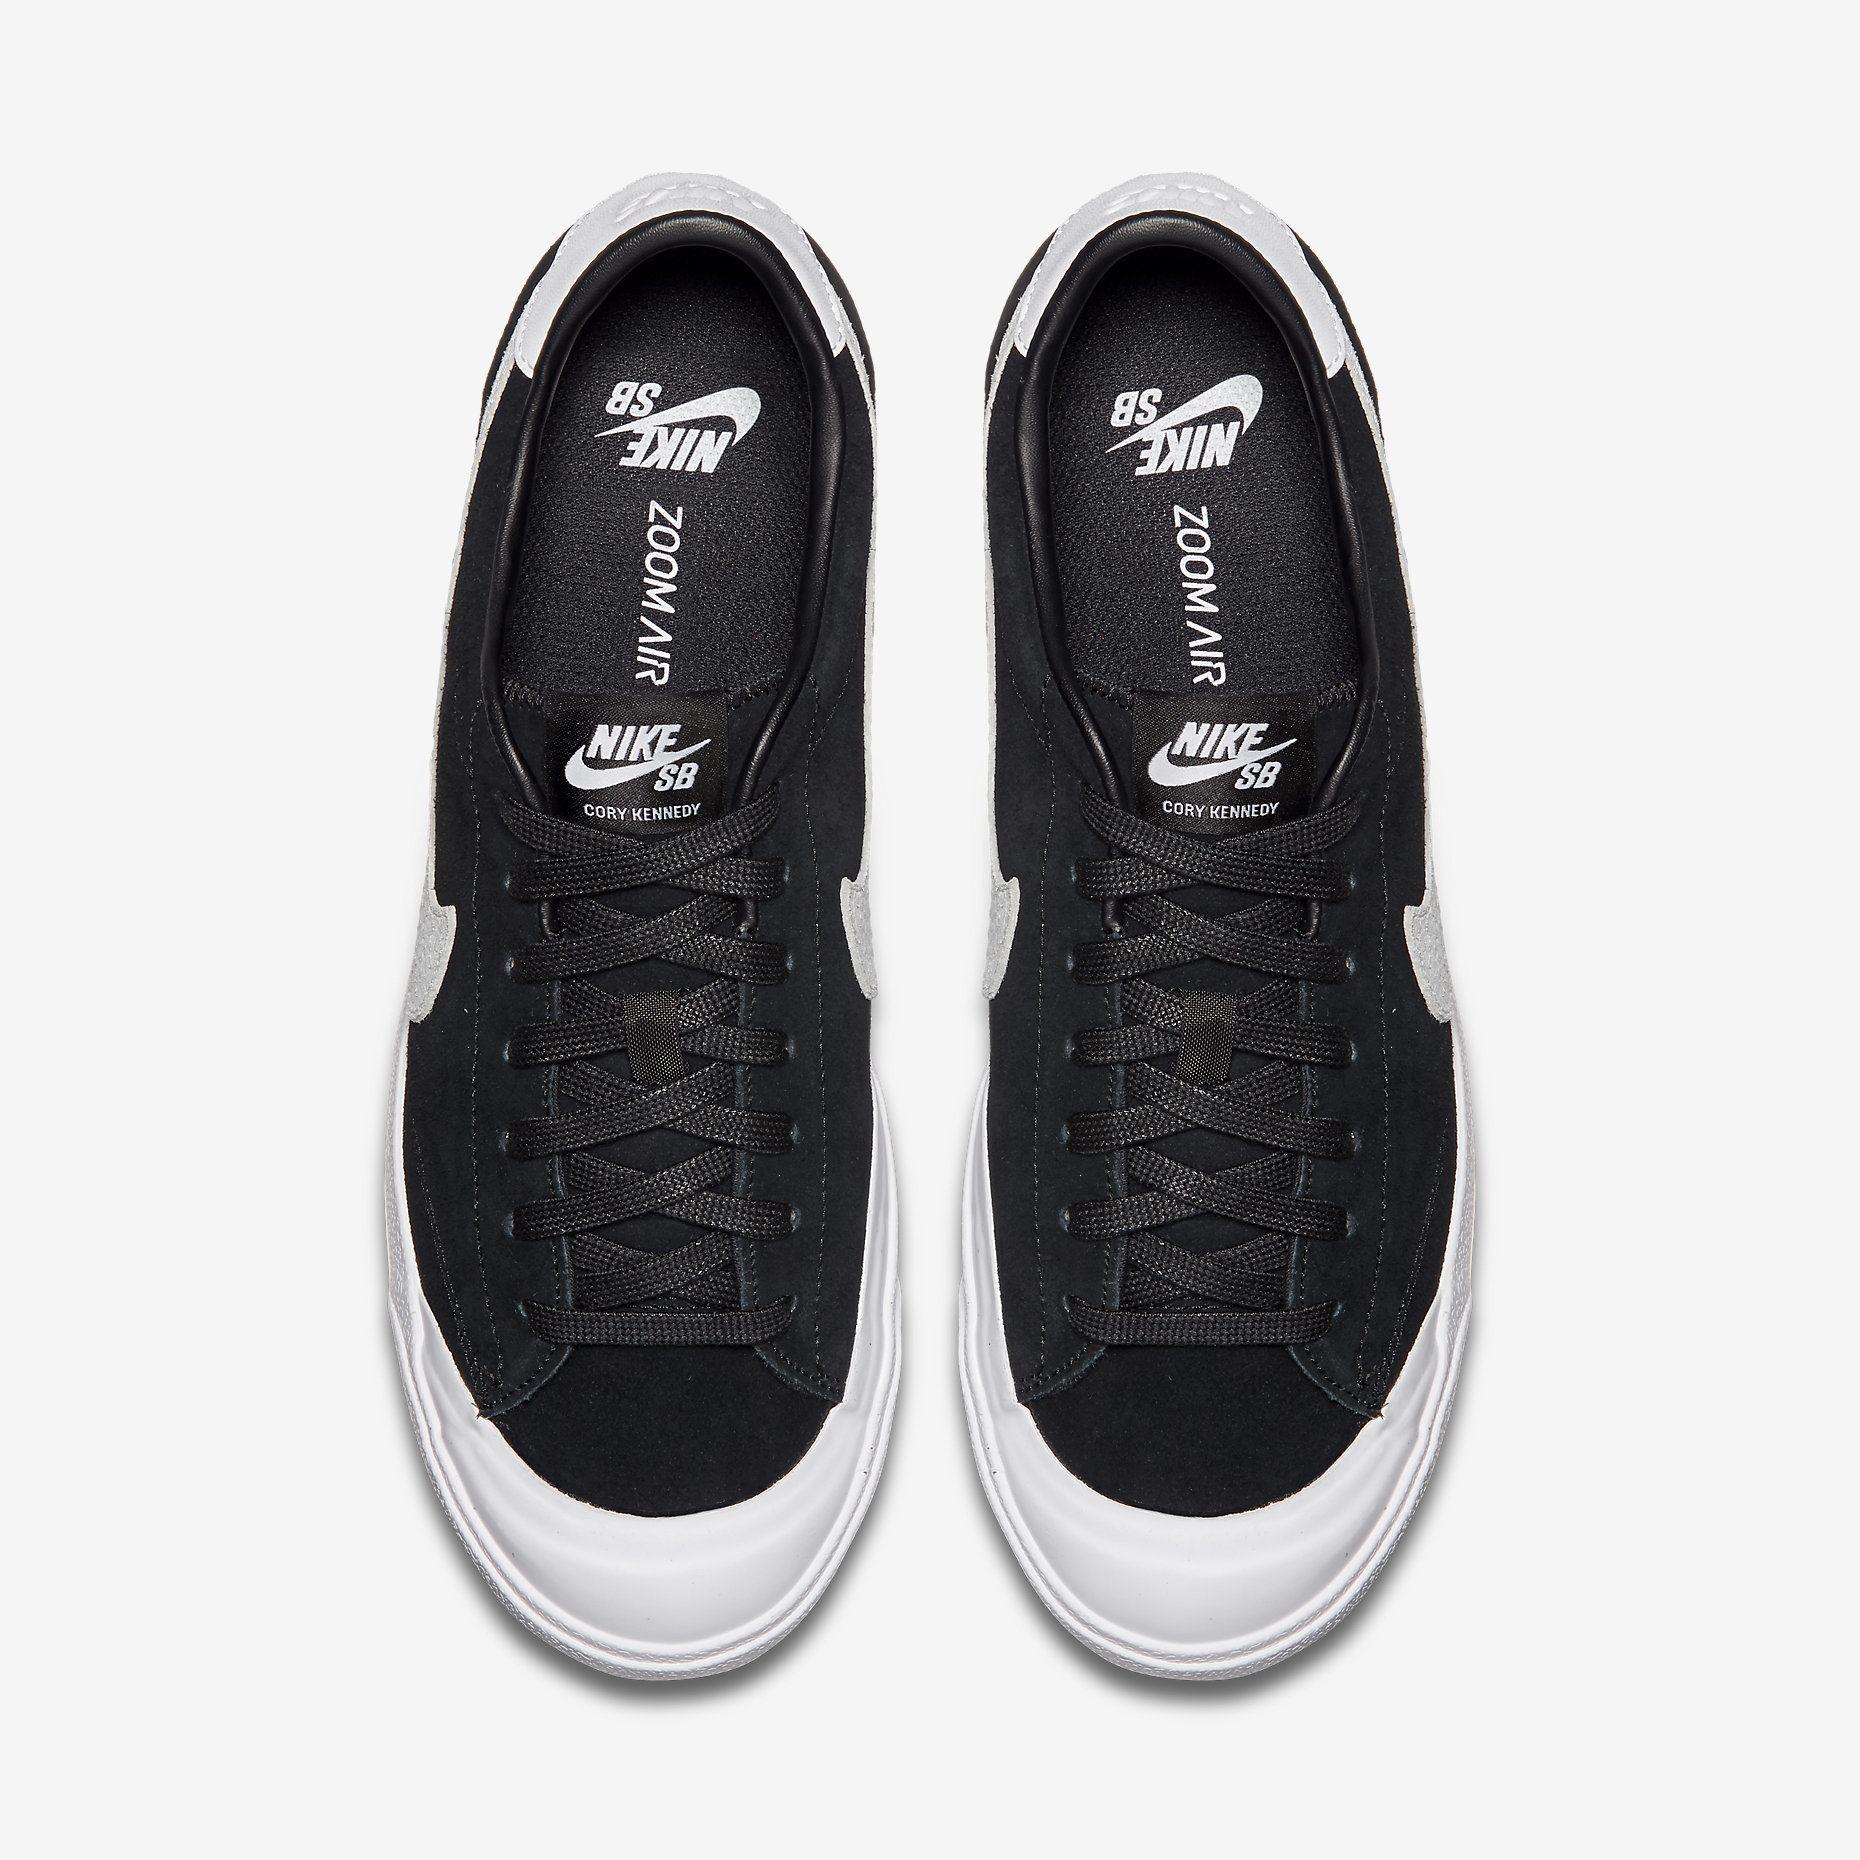 palo Fuera de plazo ducha  Nike SB Zoom All Court CK Skateschoen heren. Nike Store NL